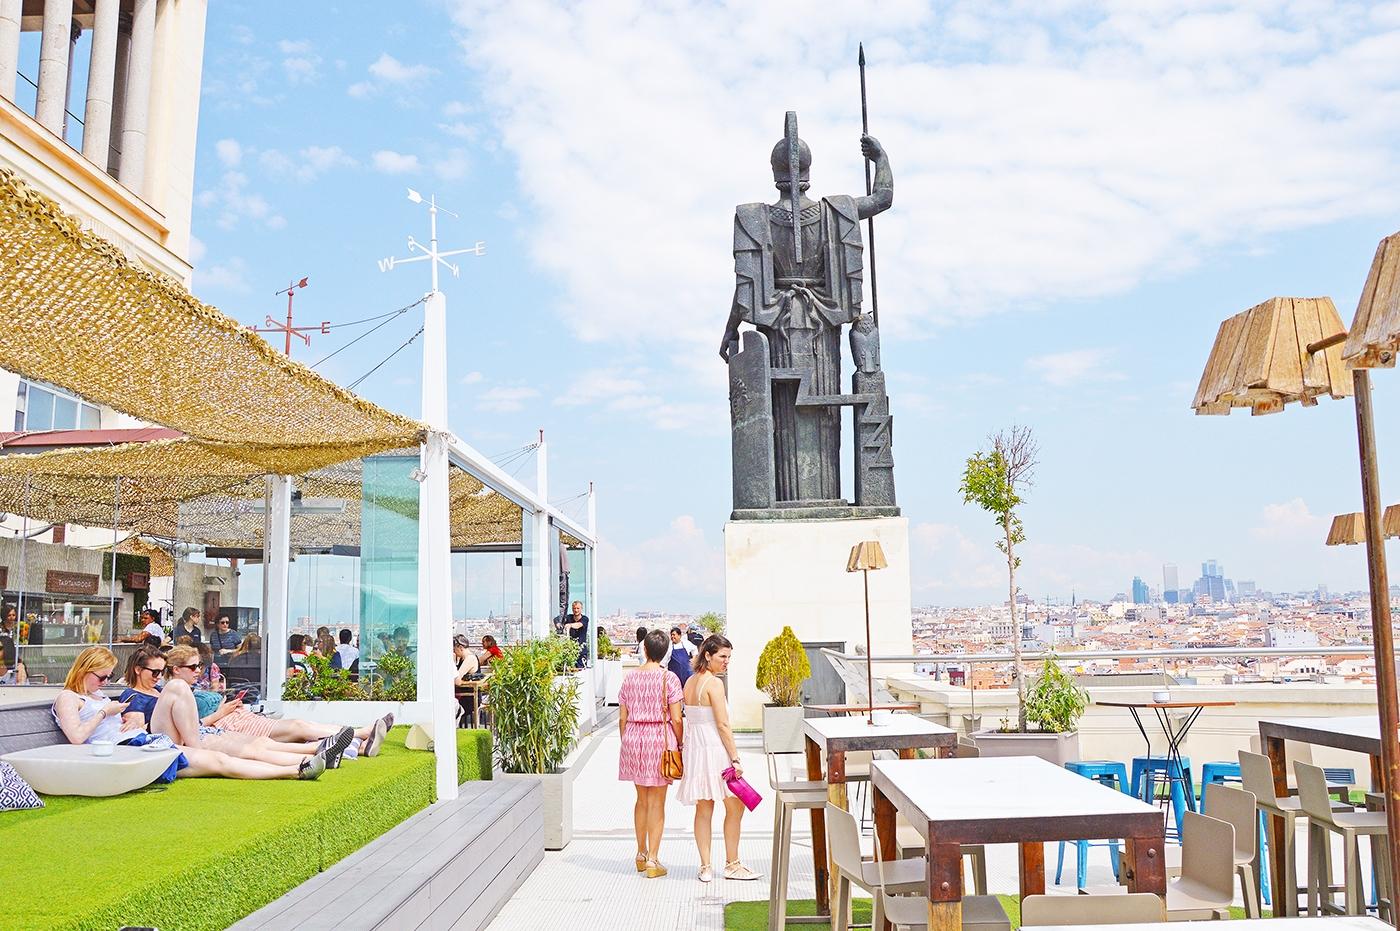 ¿Visitas España por un día? Sácale partido a tus 24 horas en Madrid